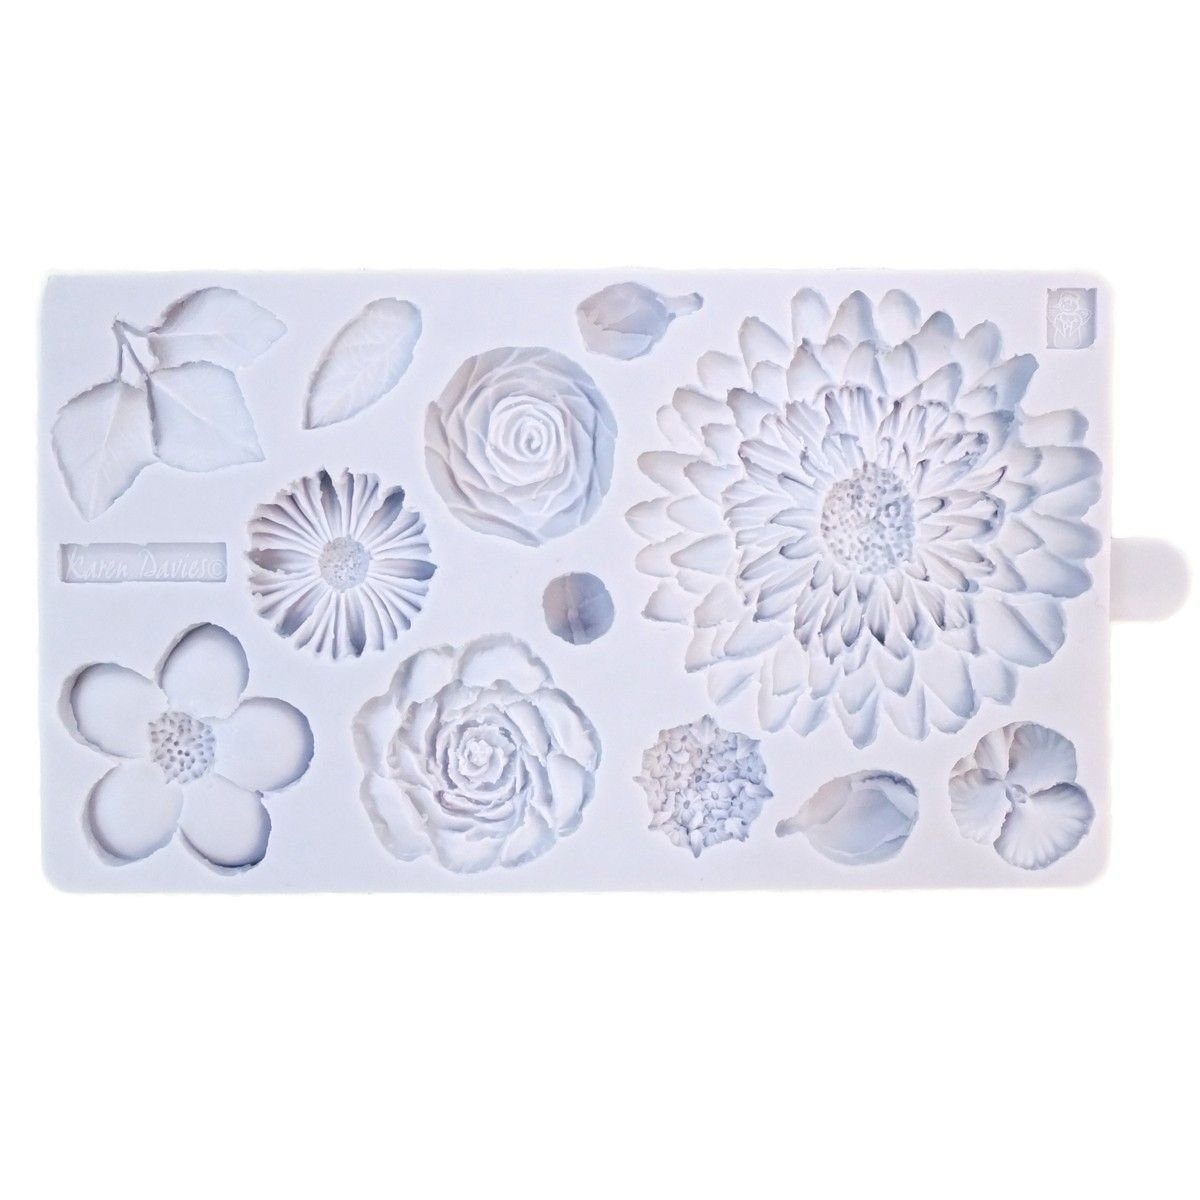 Karen Davies -Silicone Mould -Buttercream Flowers - Λουλούδια Βουτηρόκρεμας Καλούπι